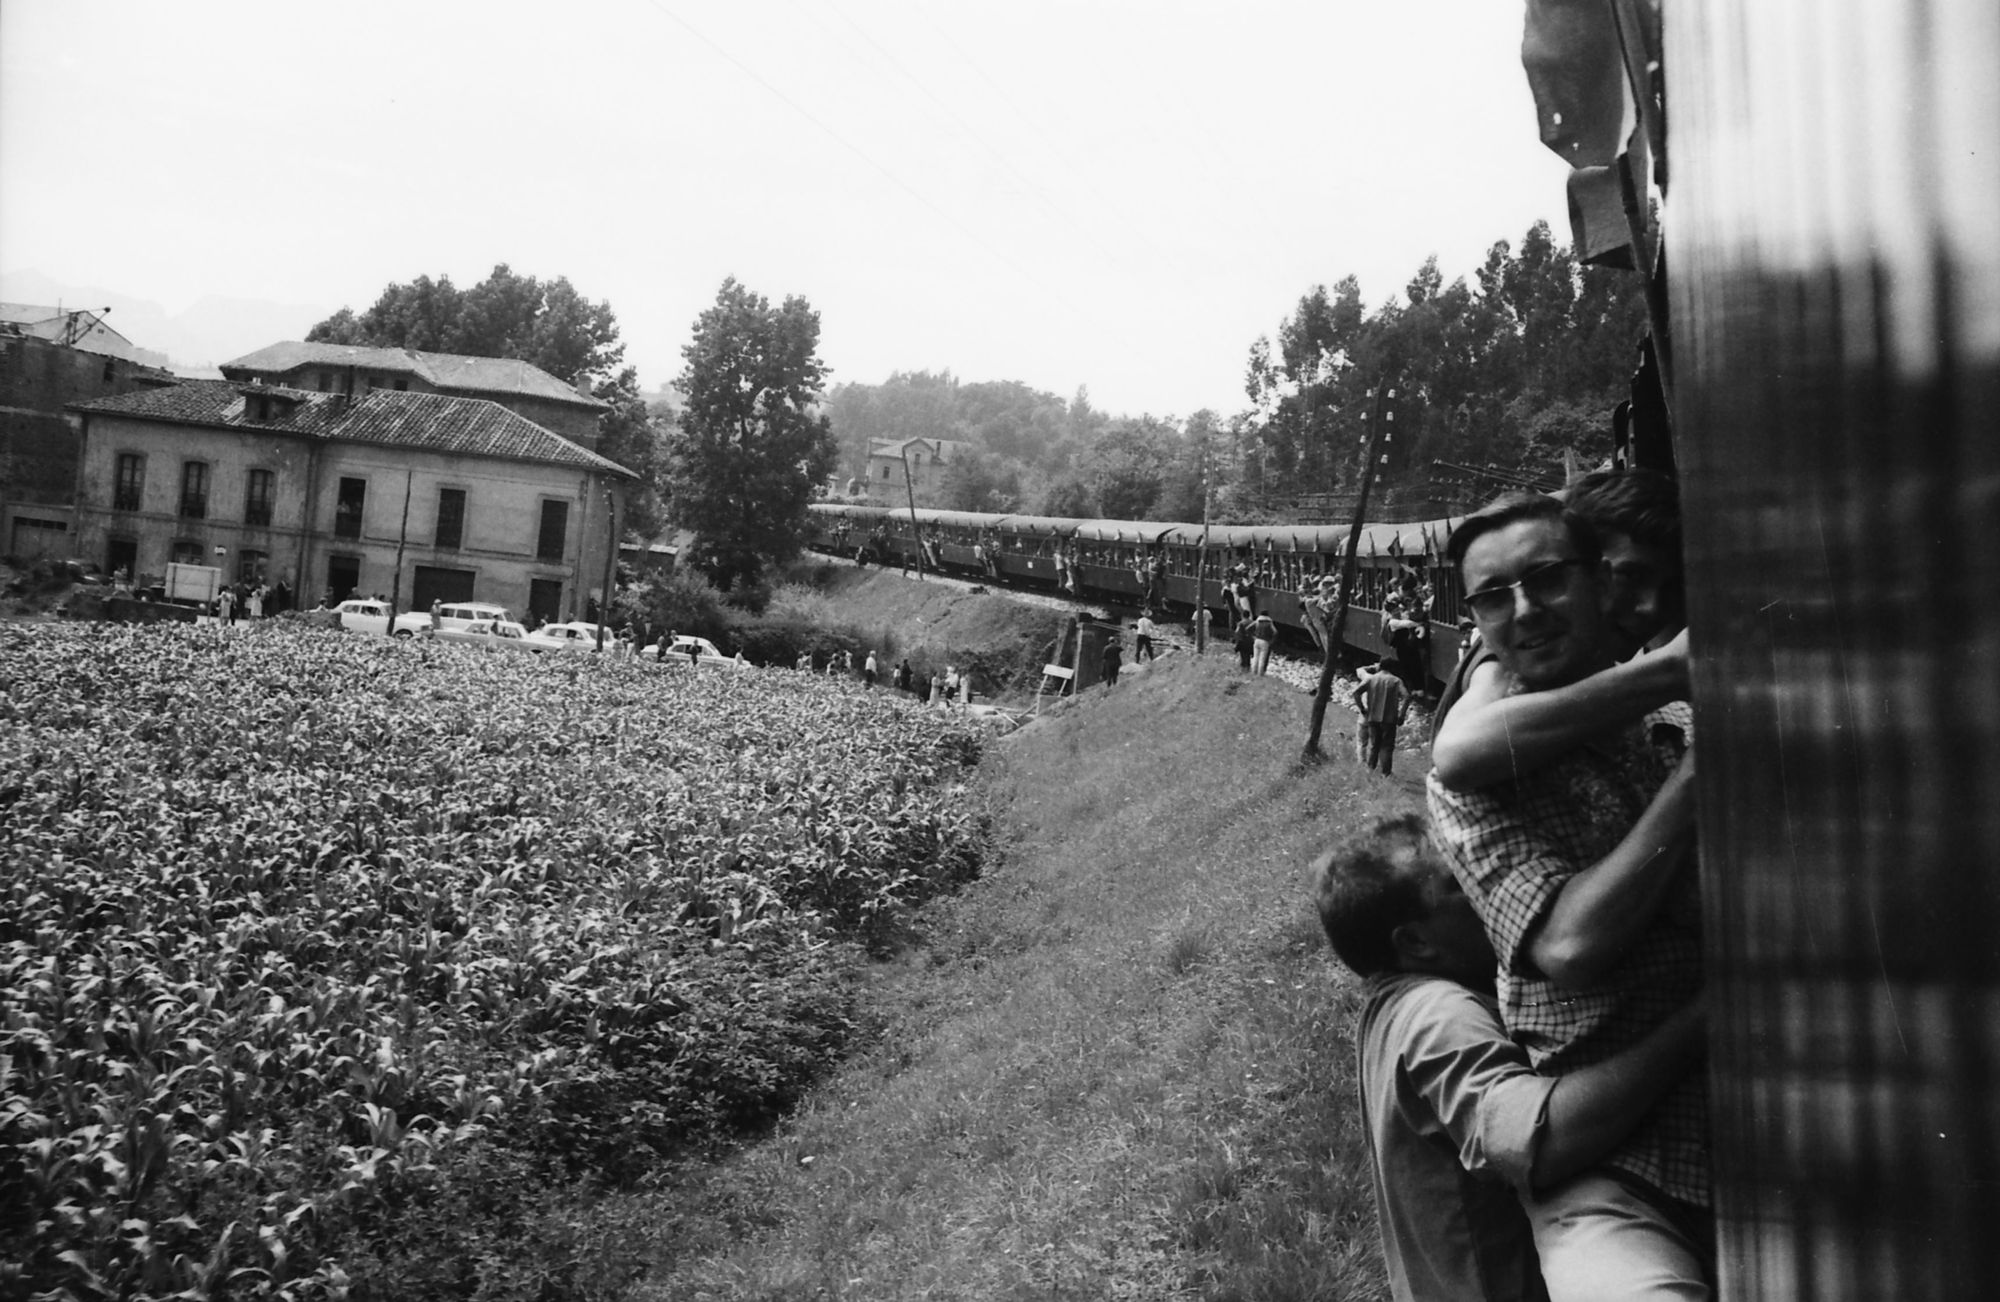 El tren fluvial. Arriondas / Les Arriondes (Parres), 1971.